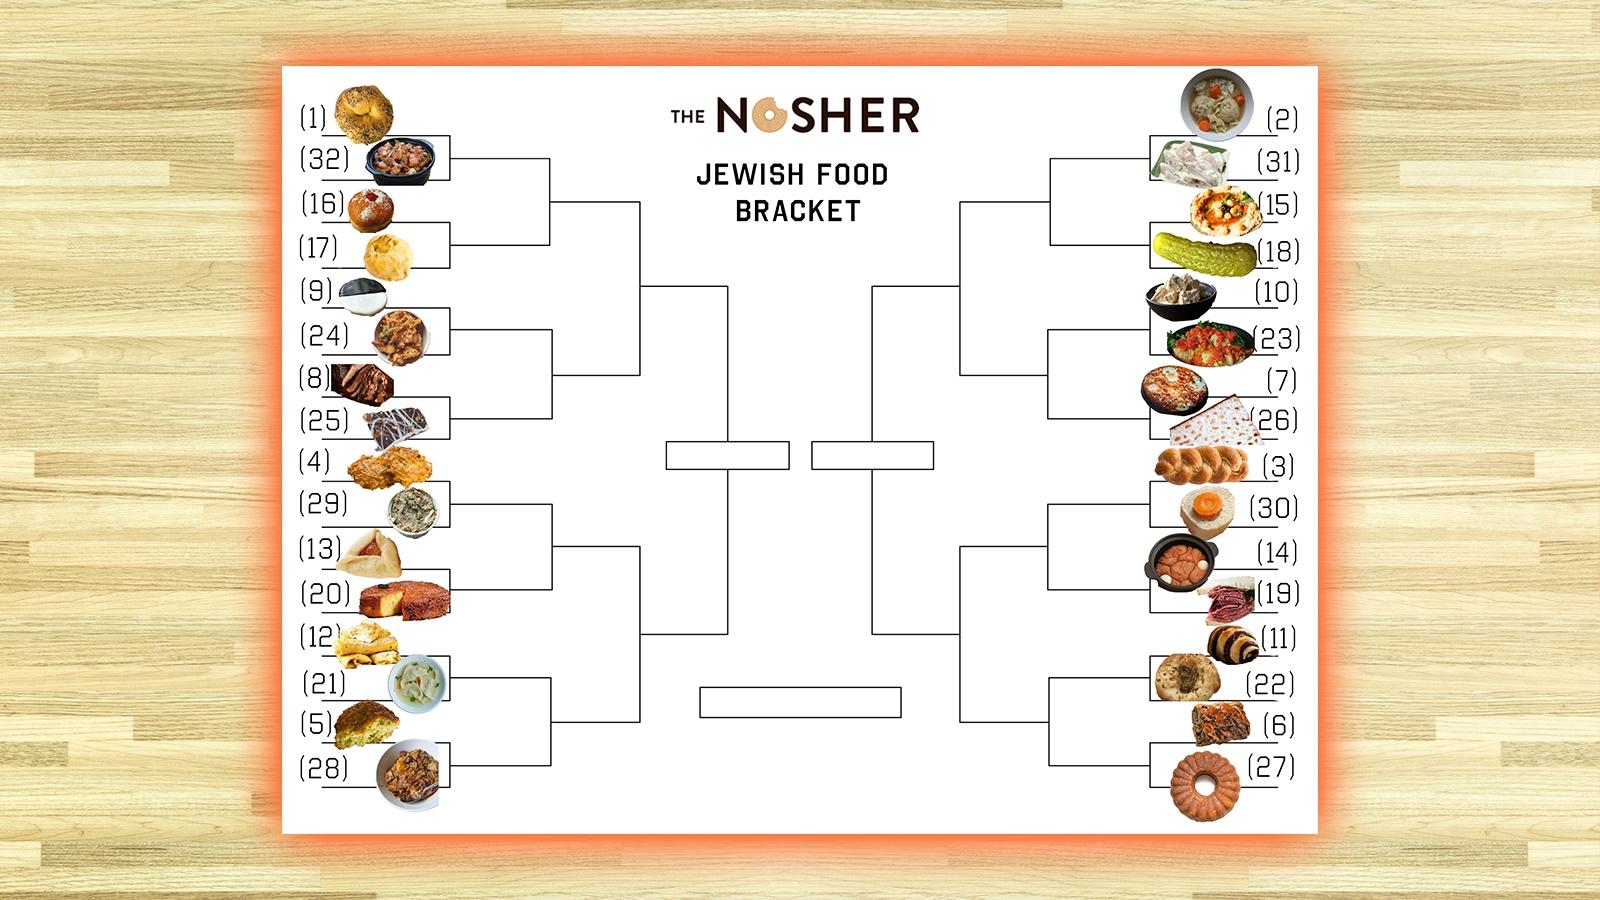 Jewish food bracket